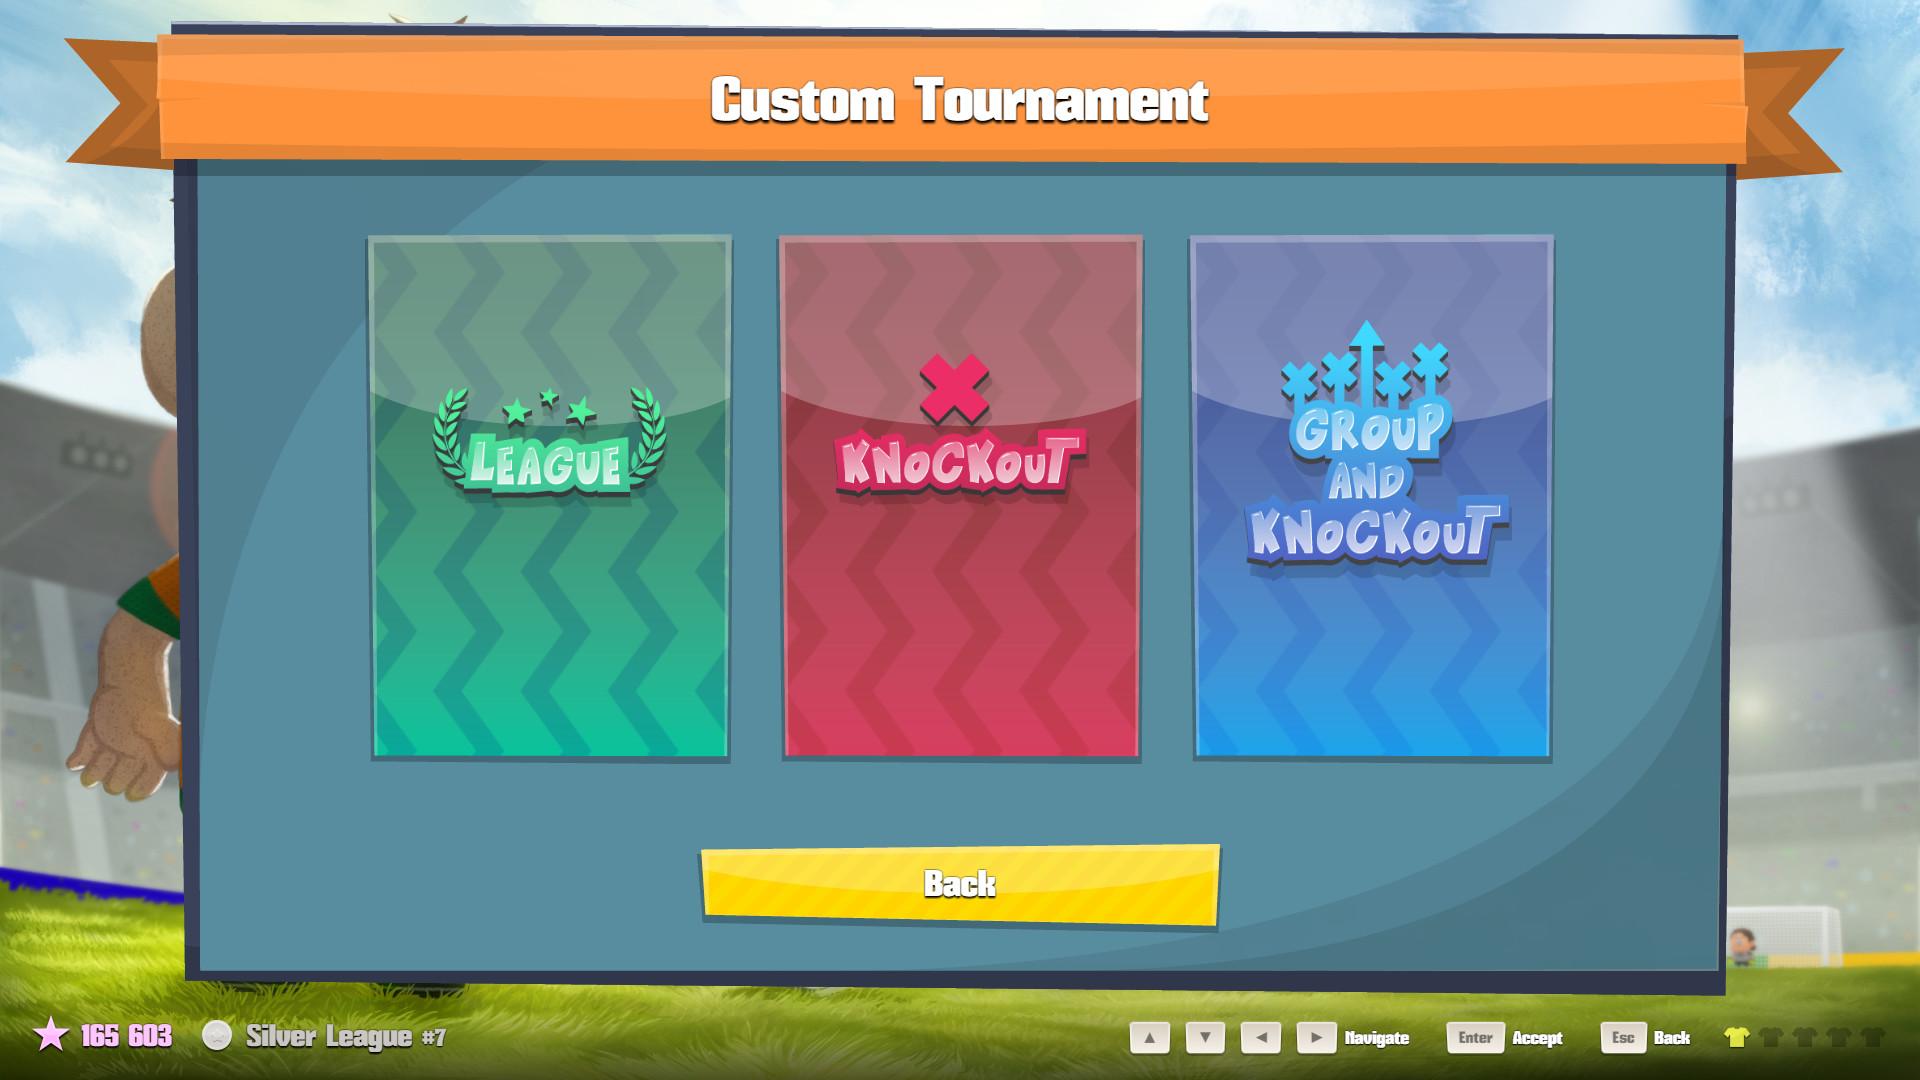 CUstom tournament types